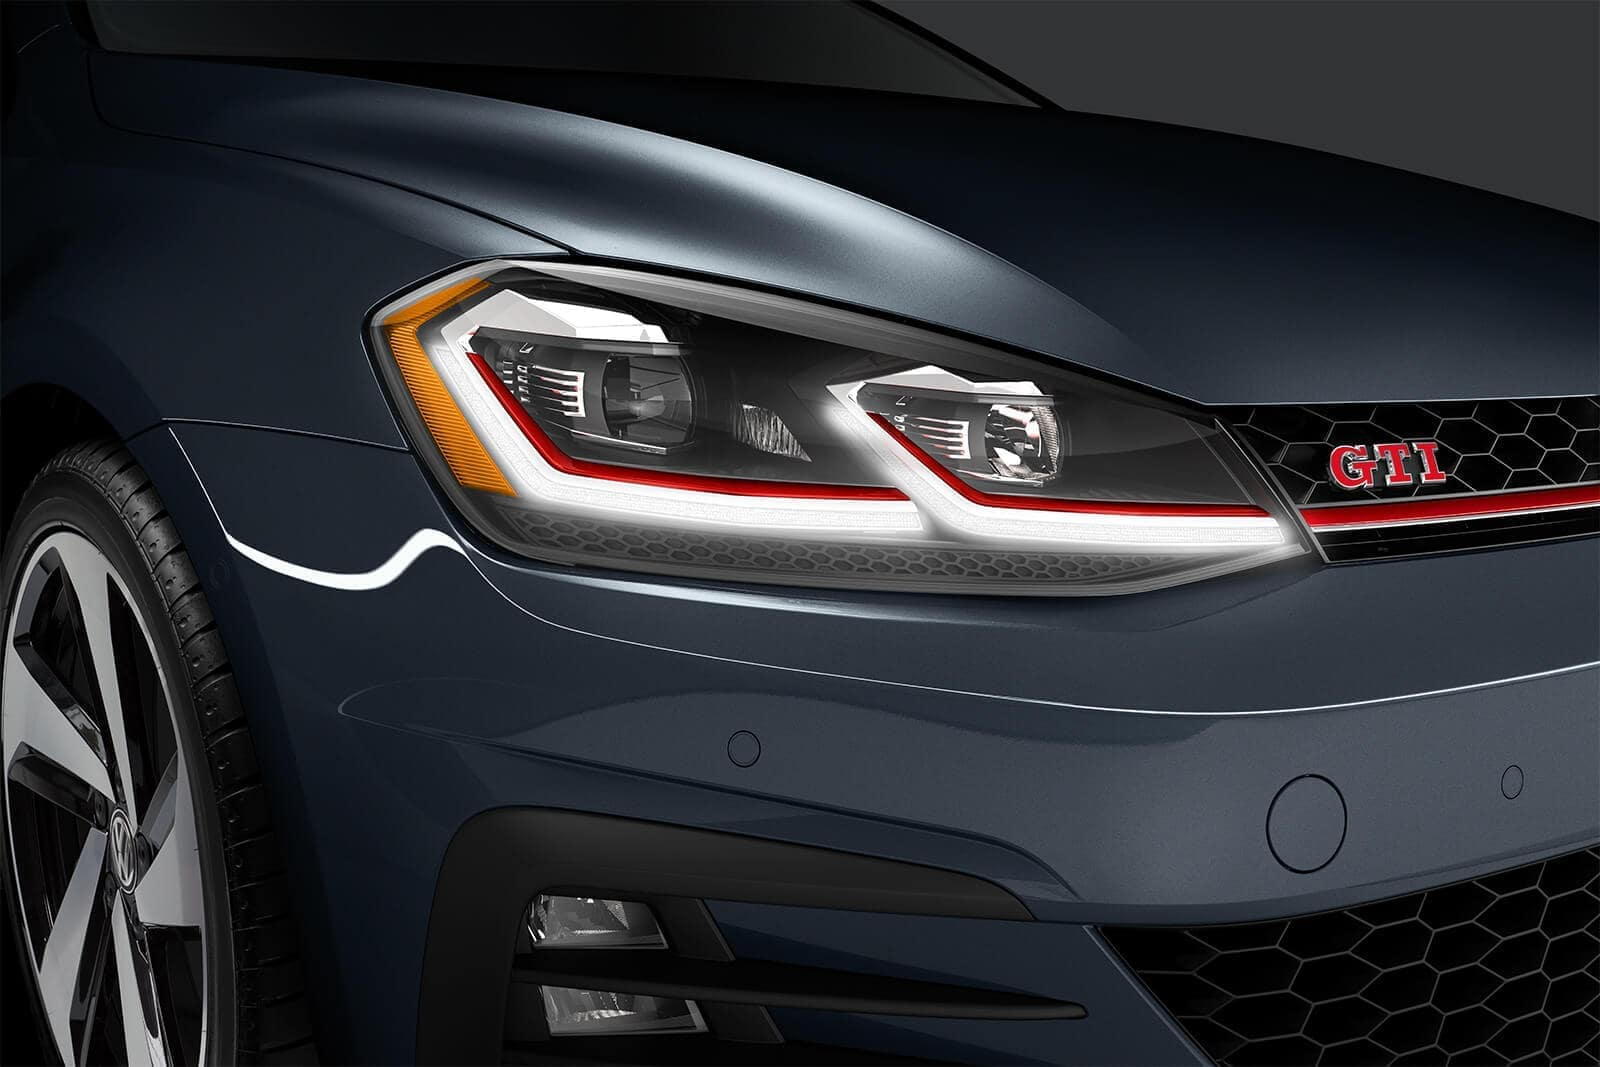 2019 VW Golf GTI Headlight